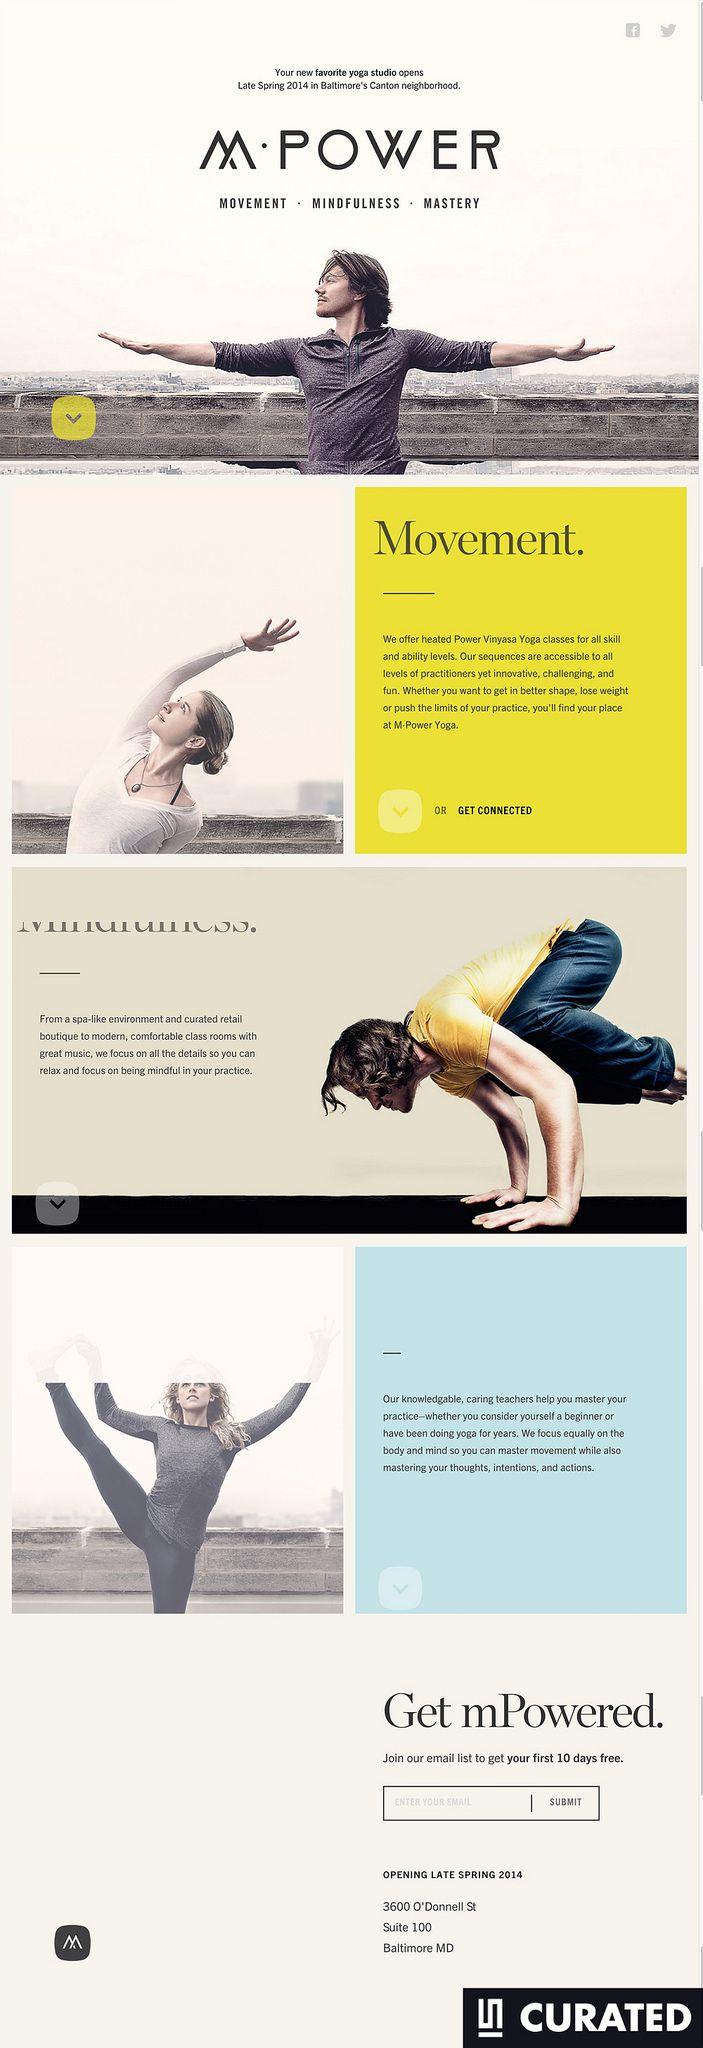 https://flic.kr/p/NtLBpS | Web-Design-Inspiration-2303